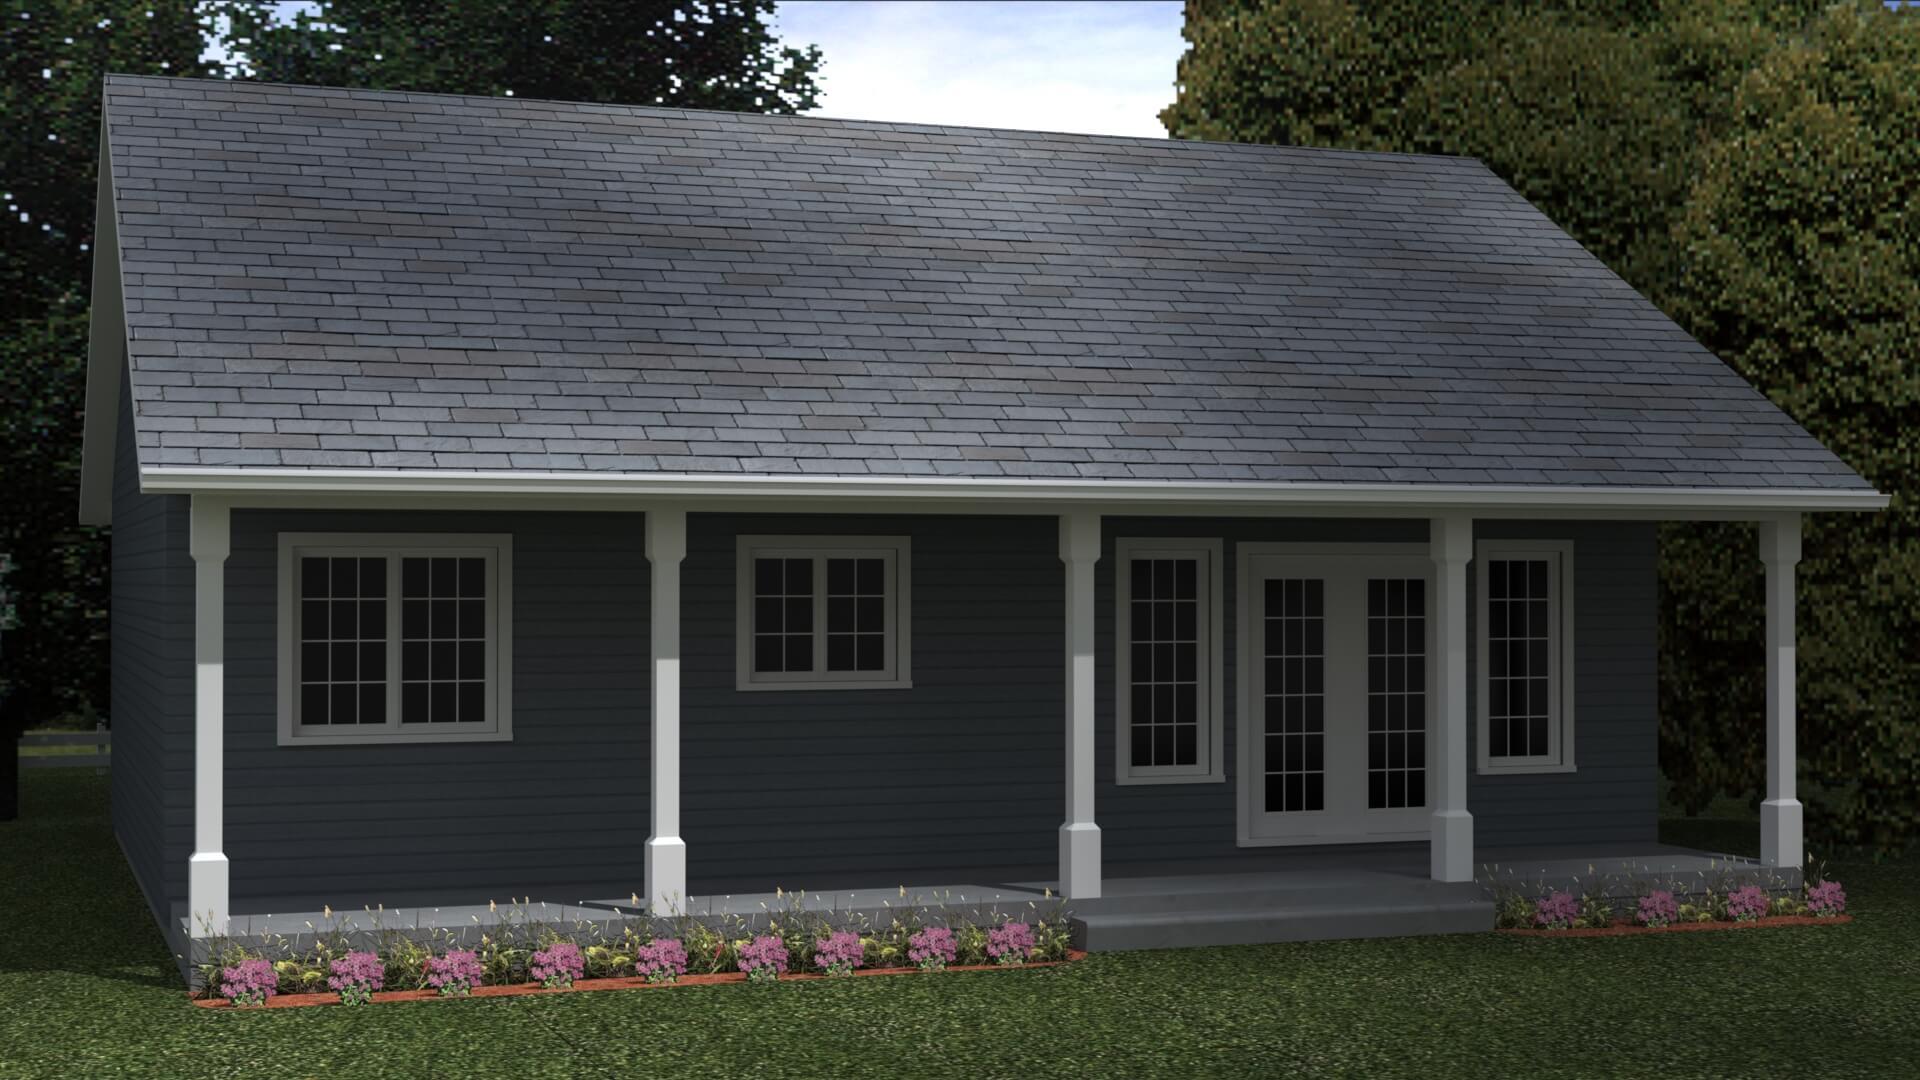 936 house exterior